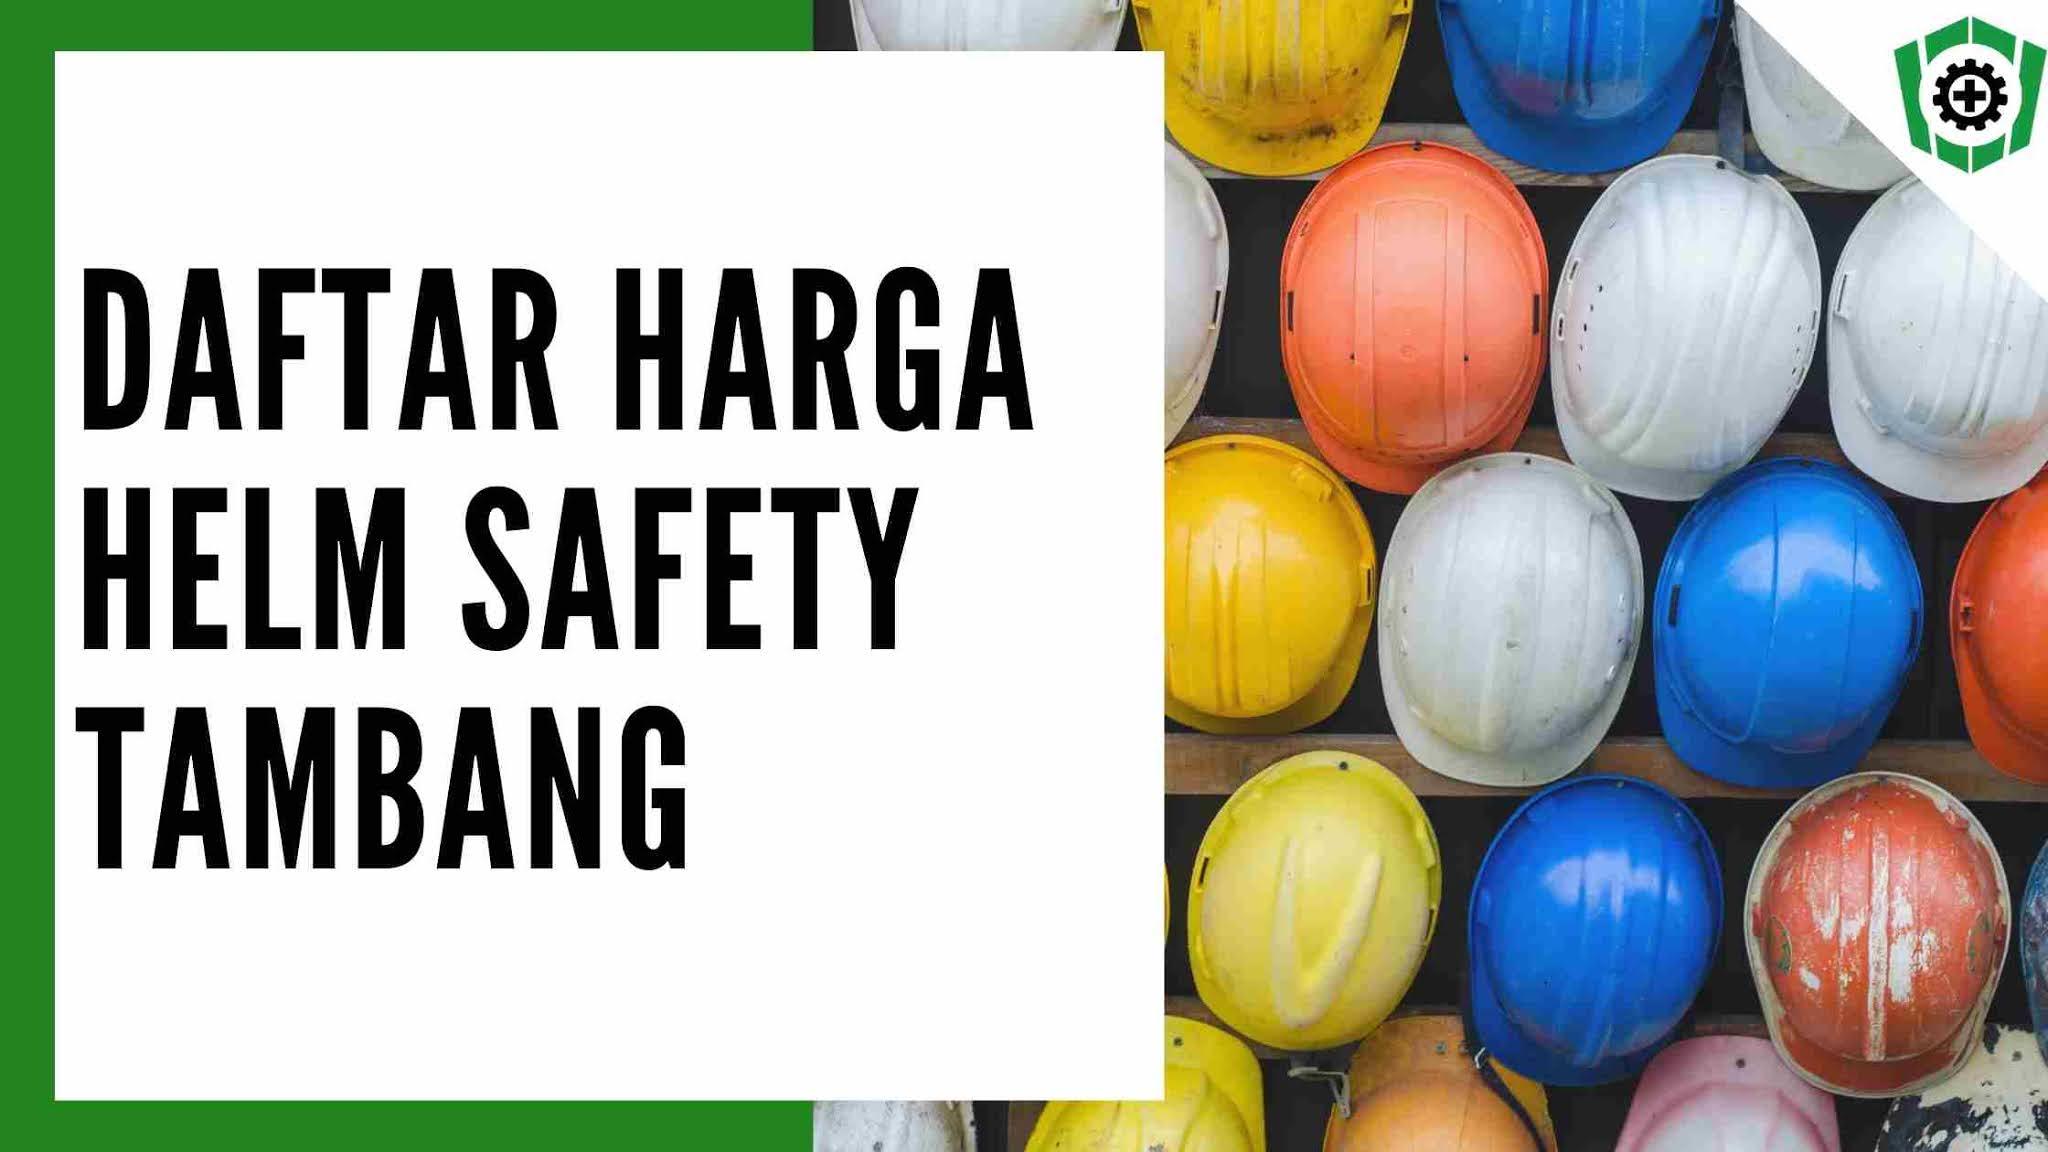 Daftar Harga Helm Safety Tambang